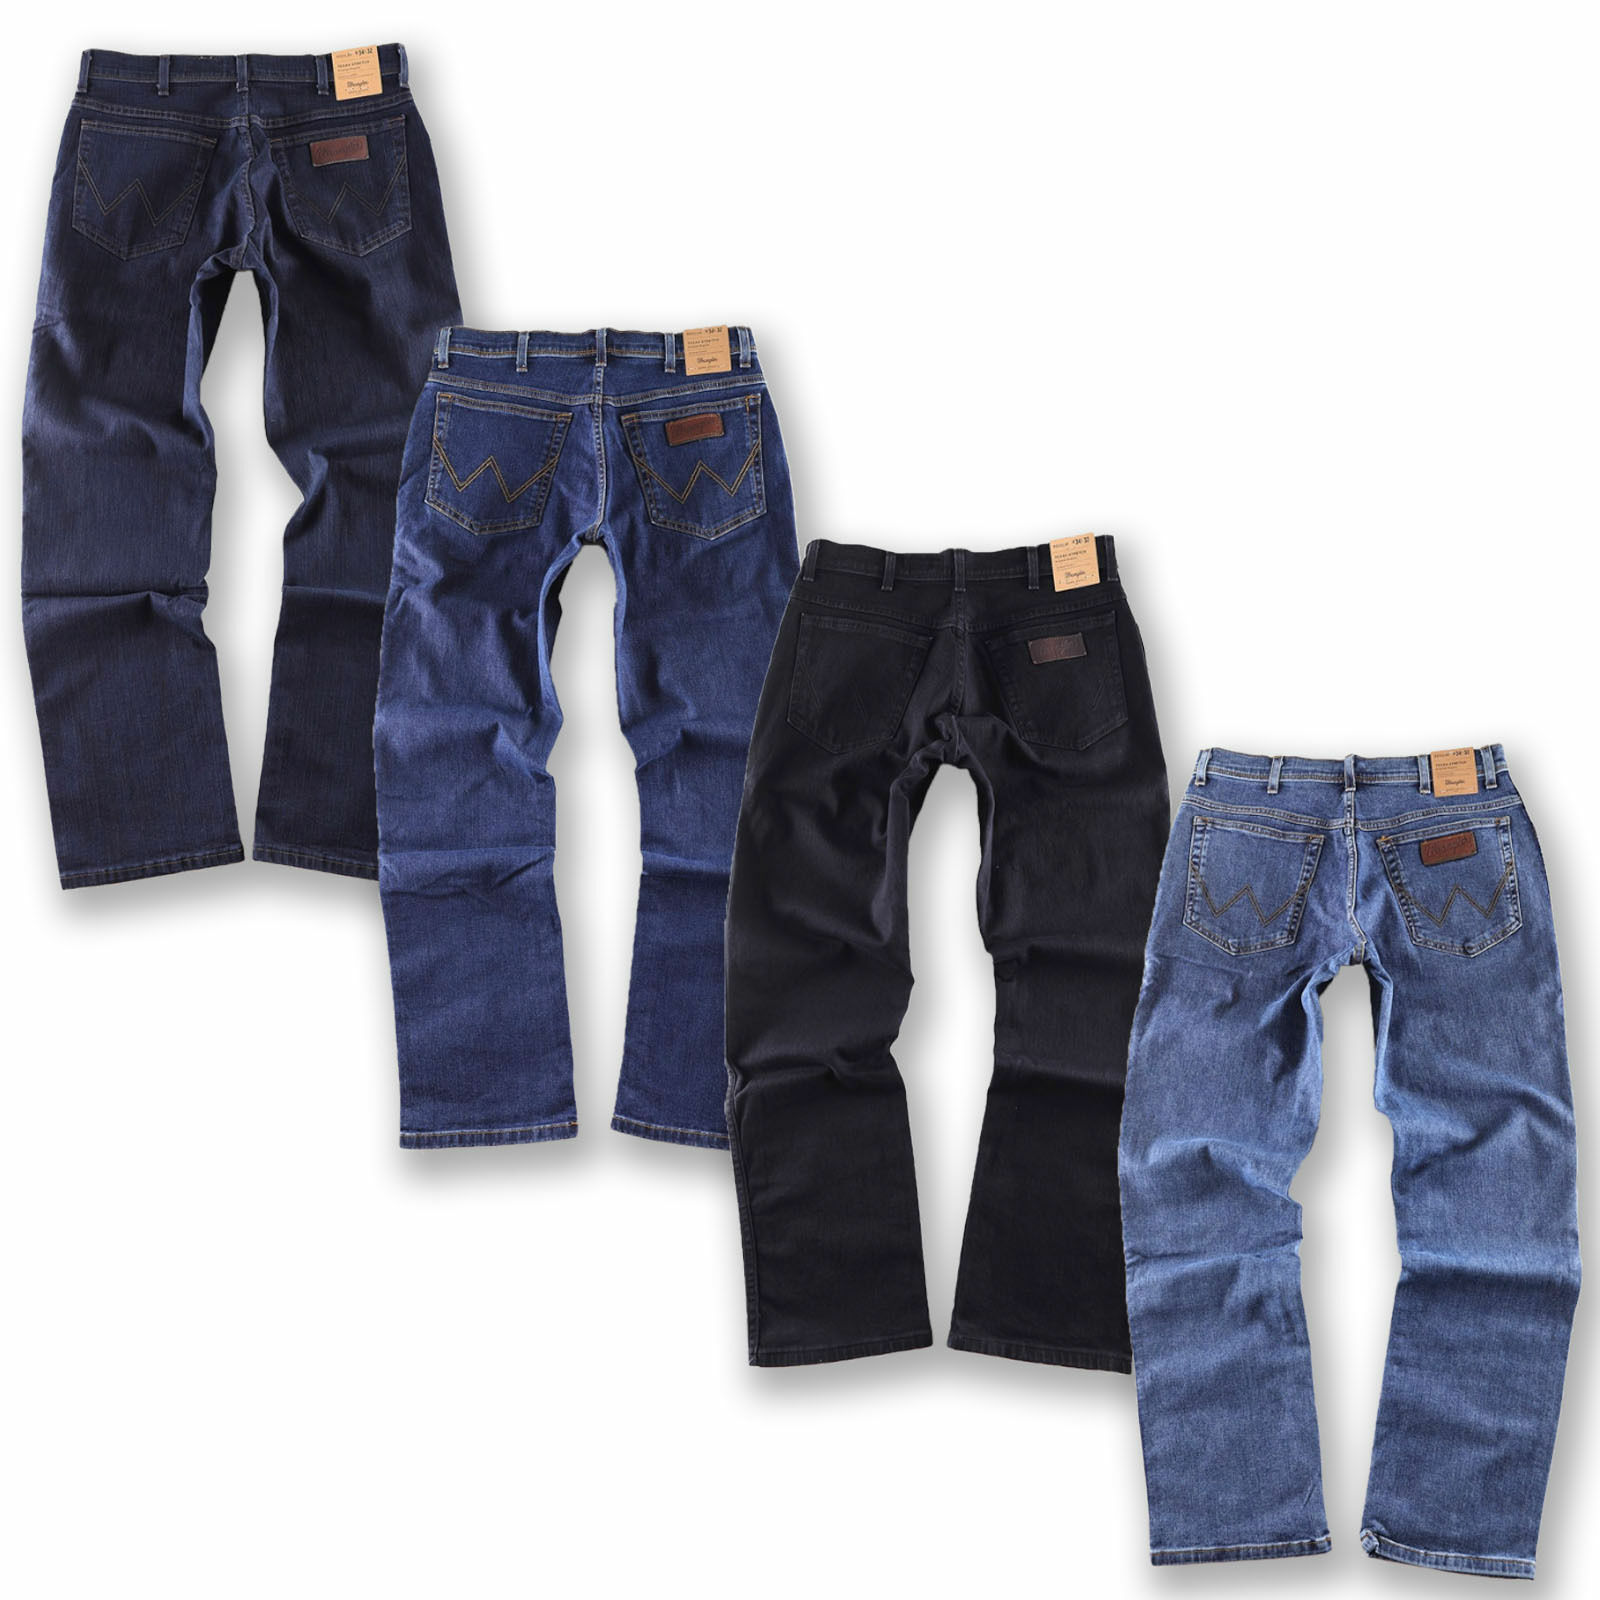 WRANGLER ORIGINAL Jeans Herrenjeans Hose Texas Stretch in 4 Farben wählbar NEU